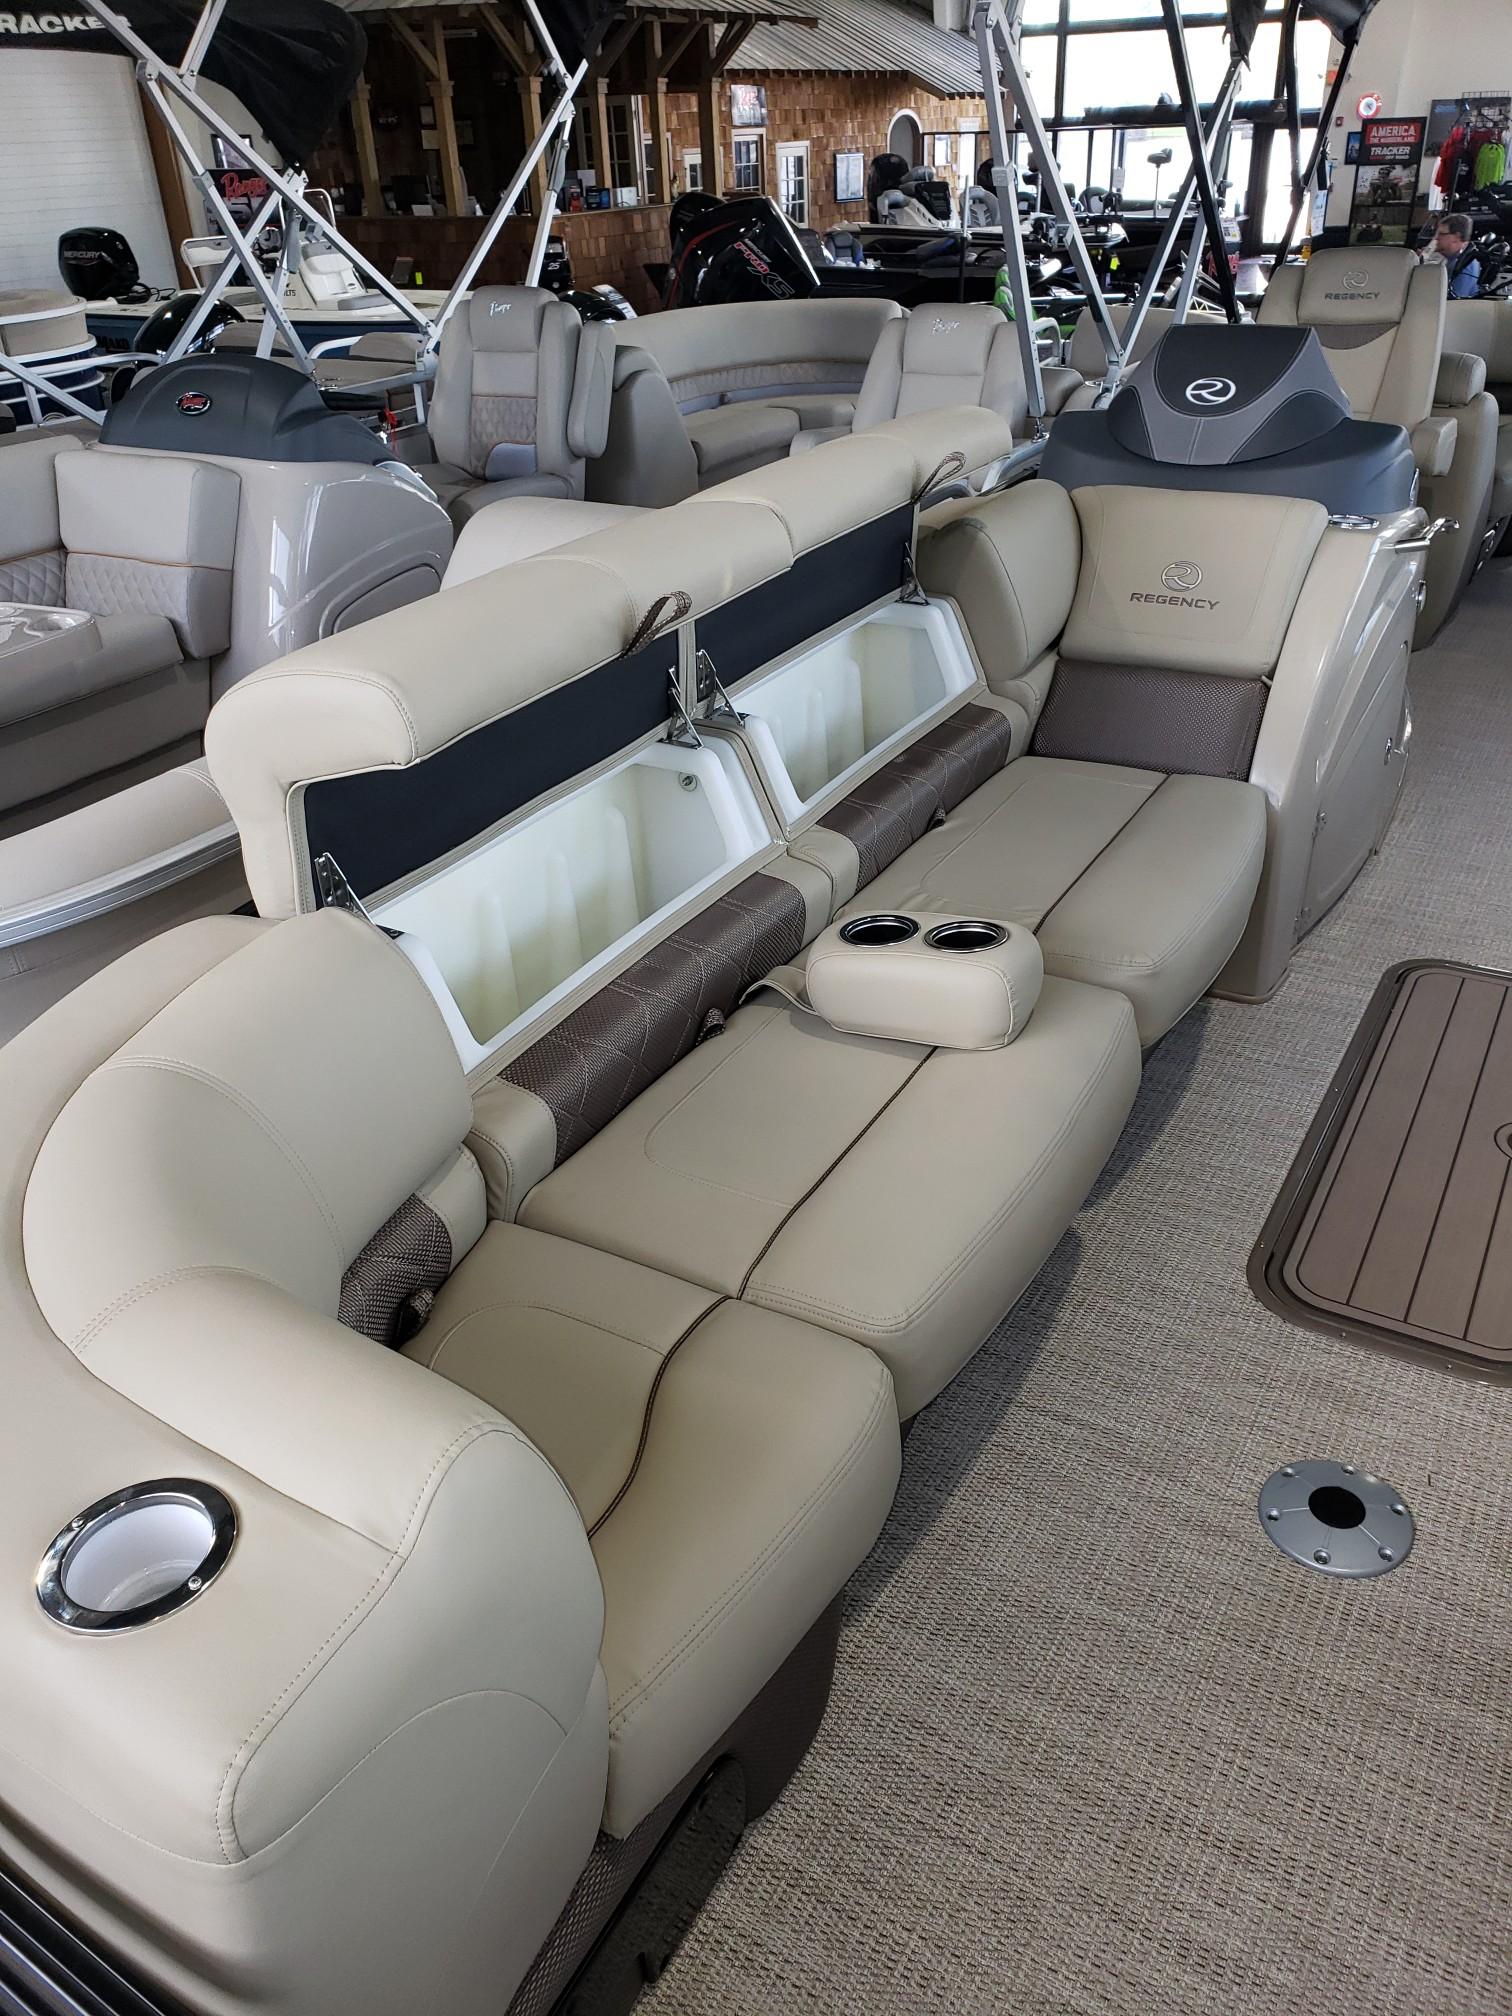 2020 Regency boat for sale, model of the boat is 250 LE3 w/300L Verado & Image # 24 of 27